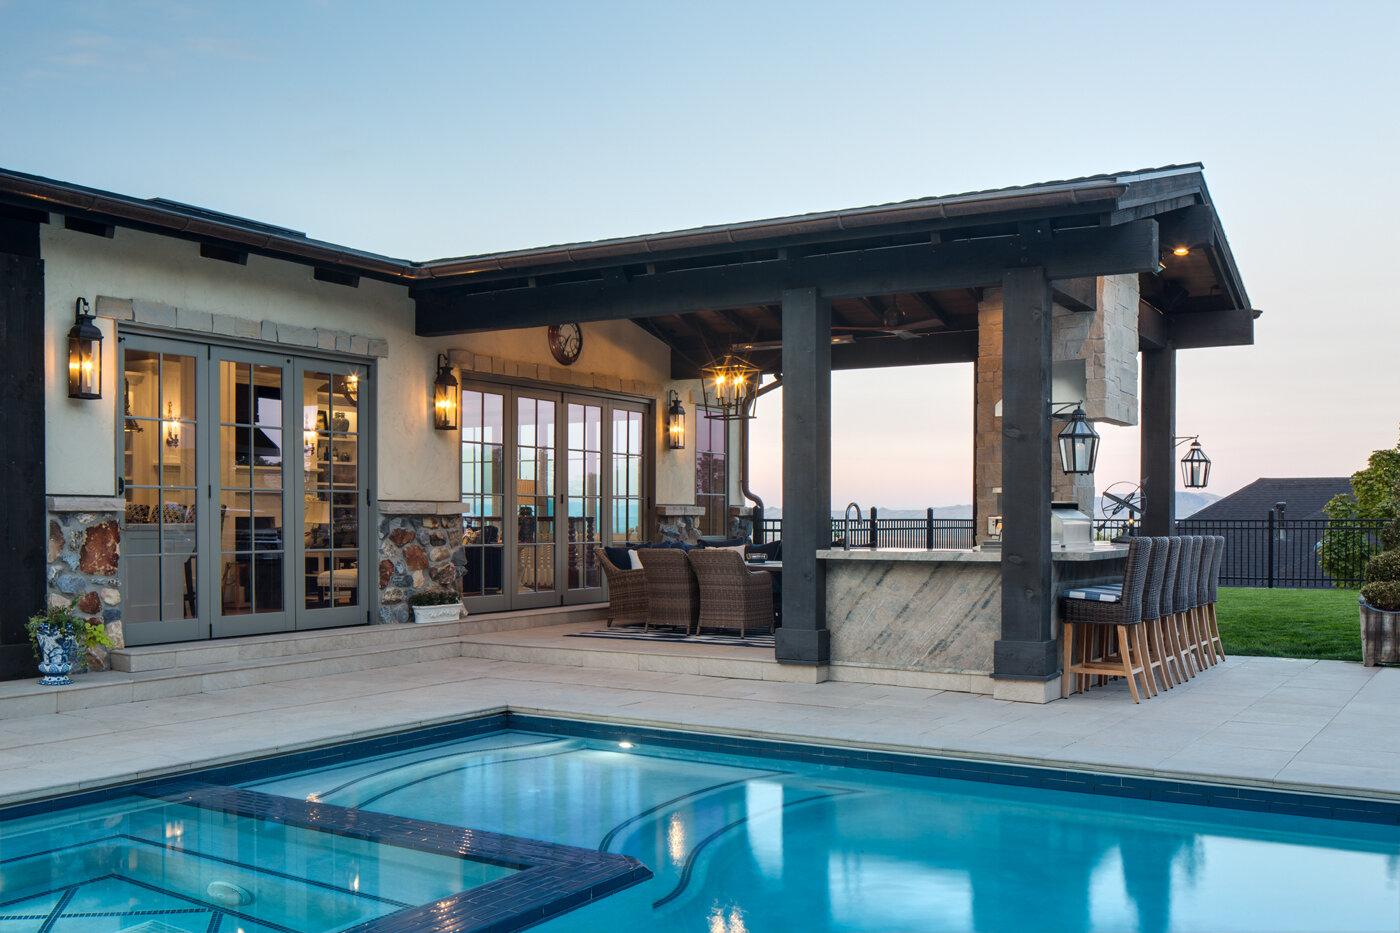 Pool and Poolhouse 2